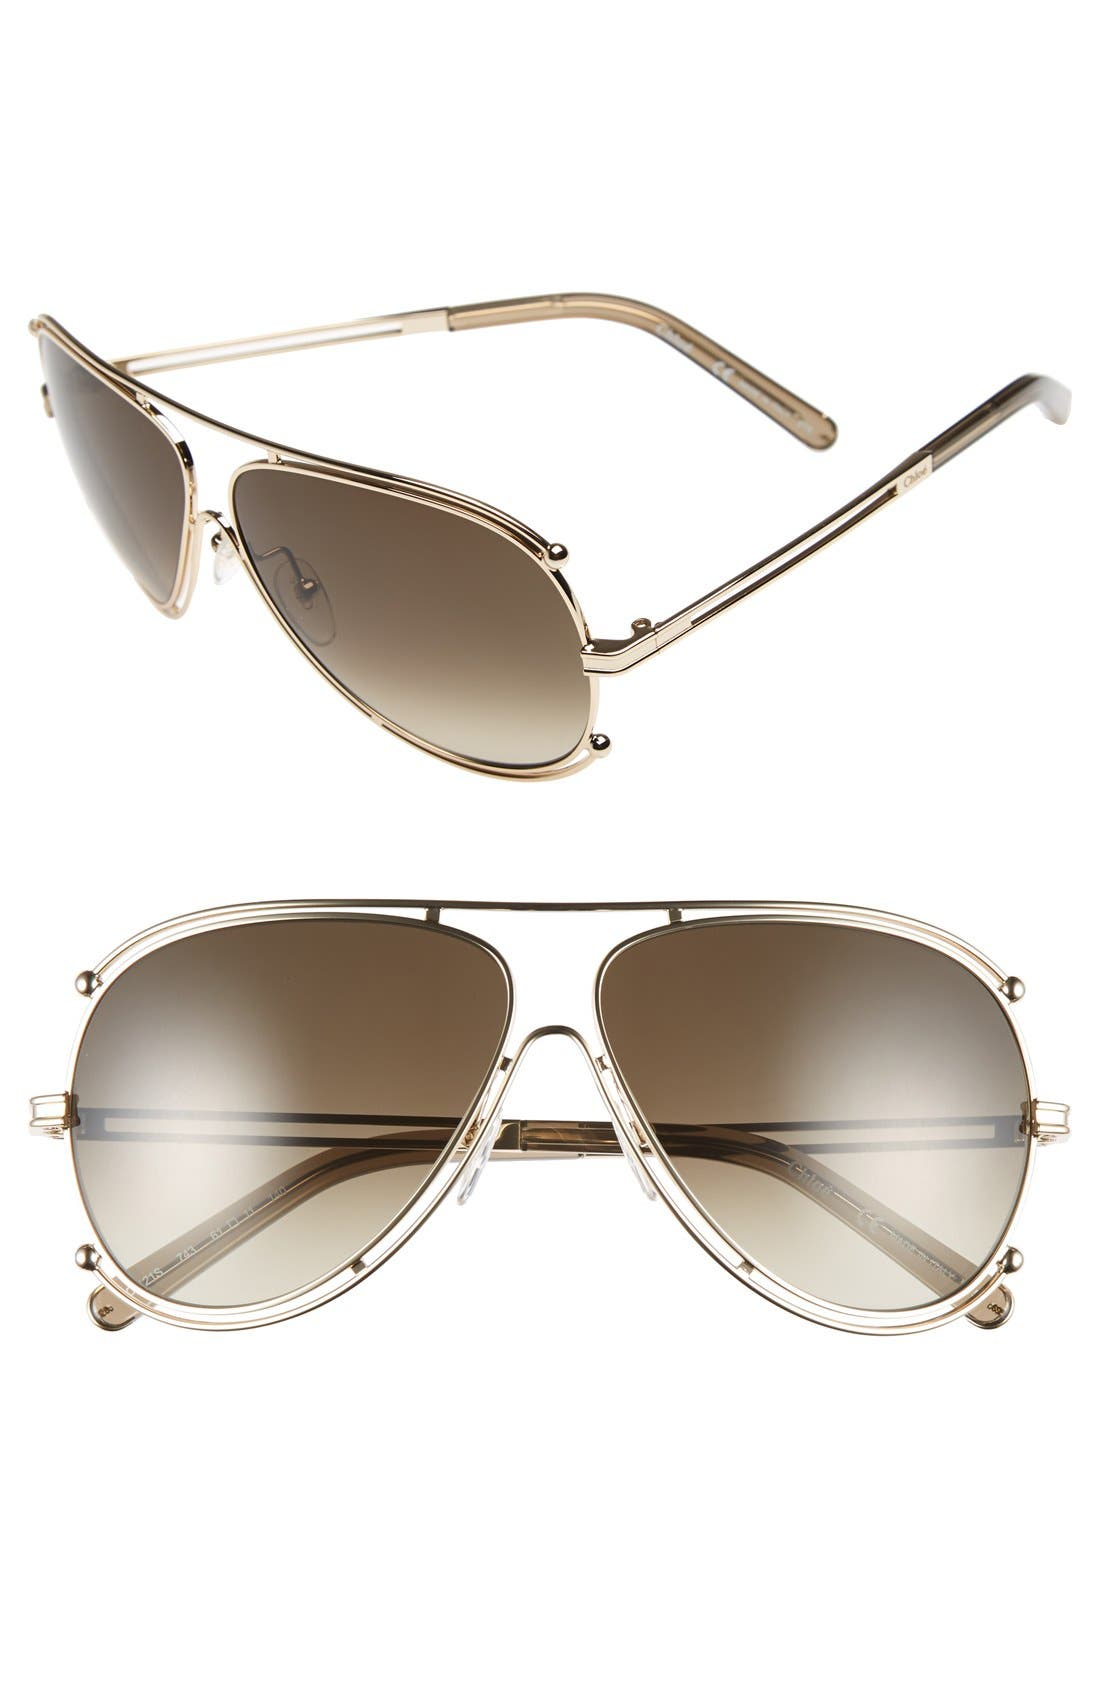 CHLOÉ 'Isidora' 61mm Aviator Sunglasses, Main, color, 710